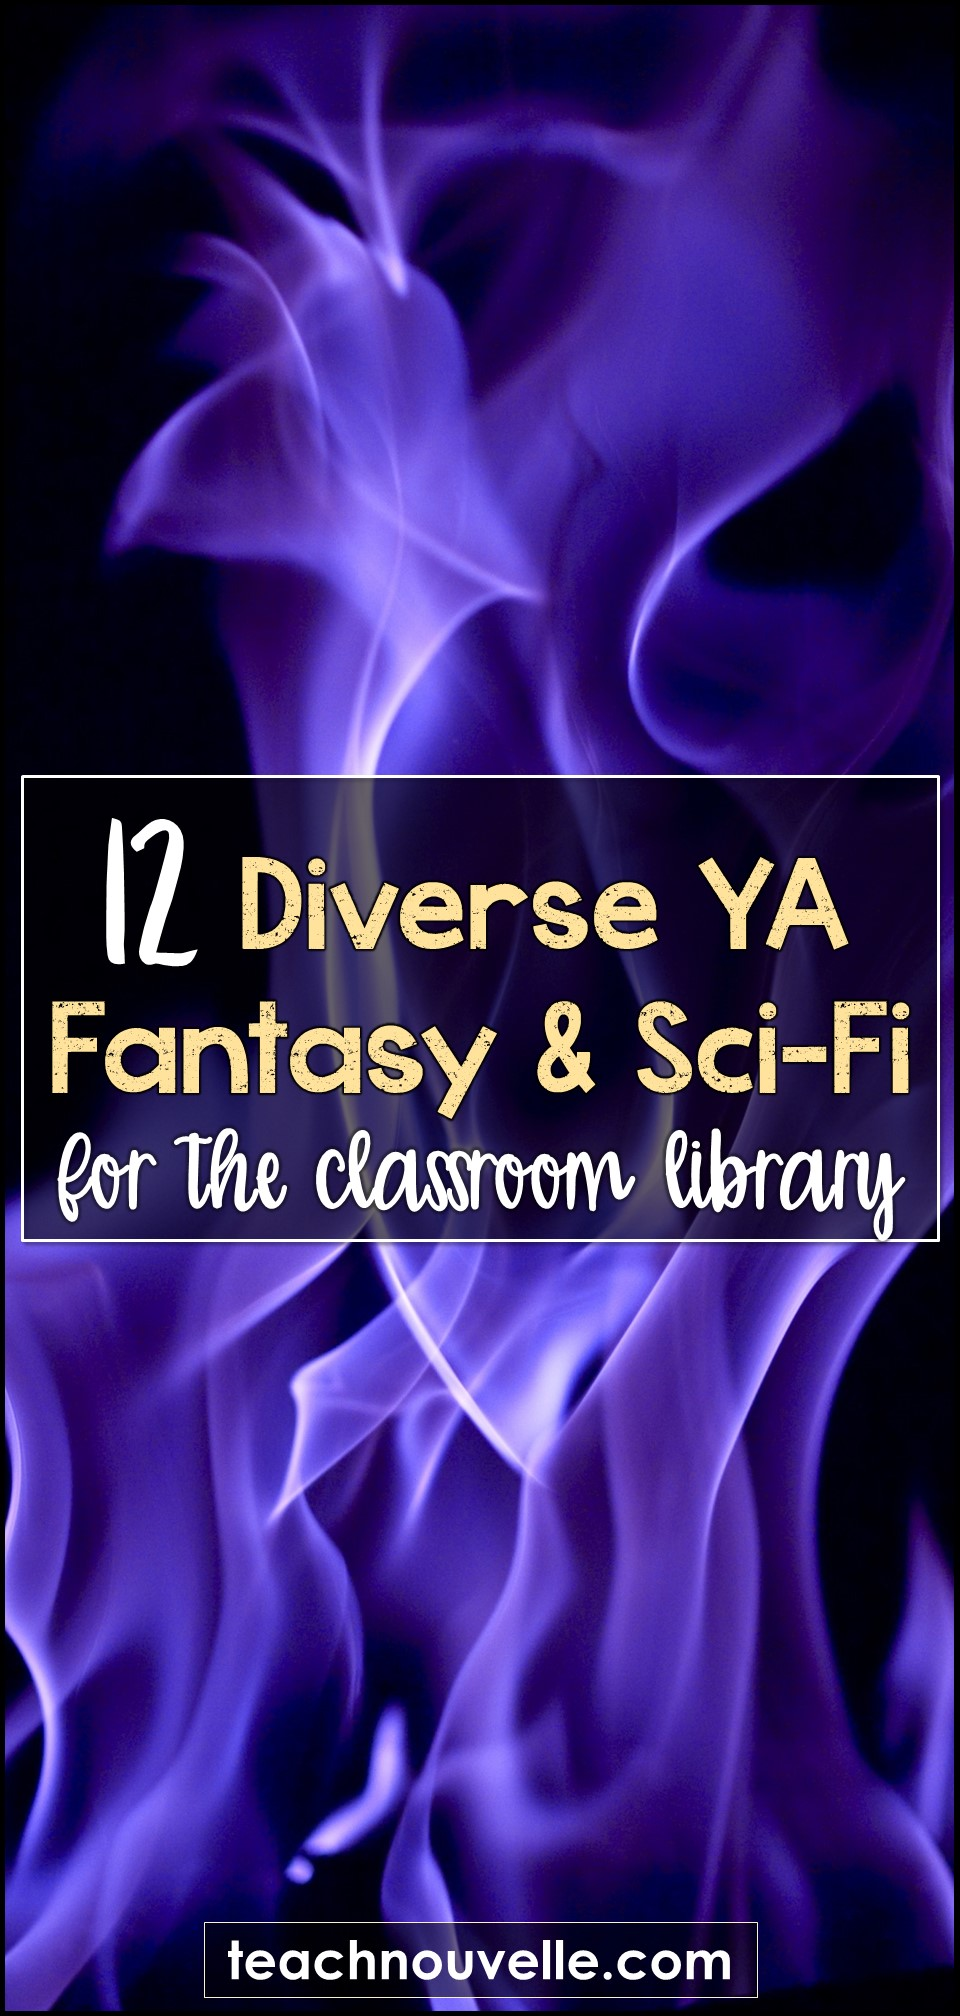 12 Diverse YA Sci-Fi and Fantasy novels